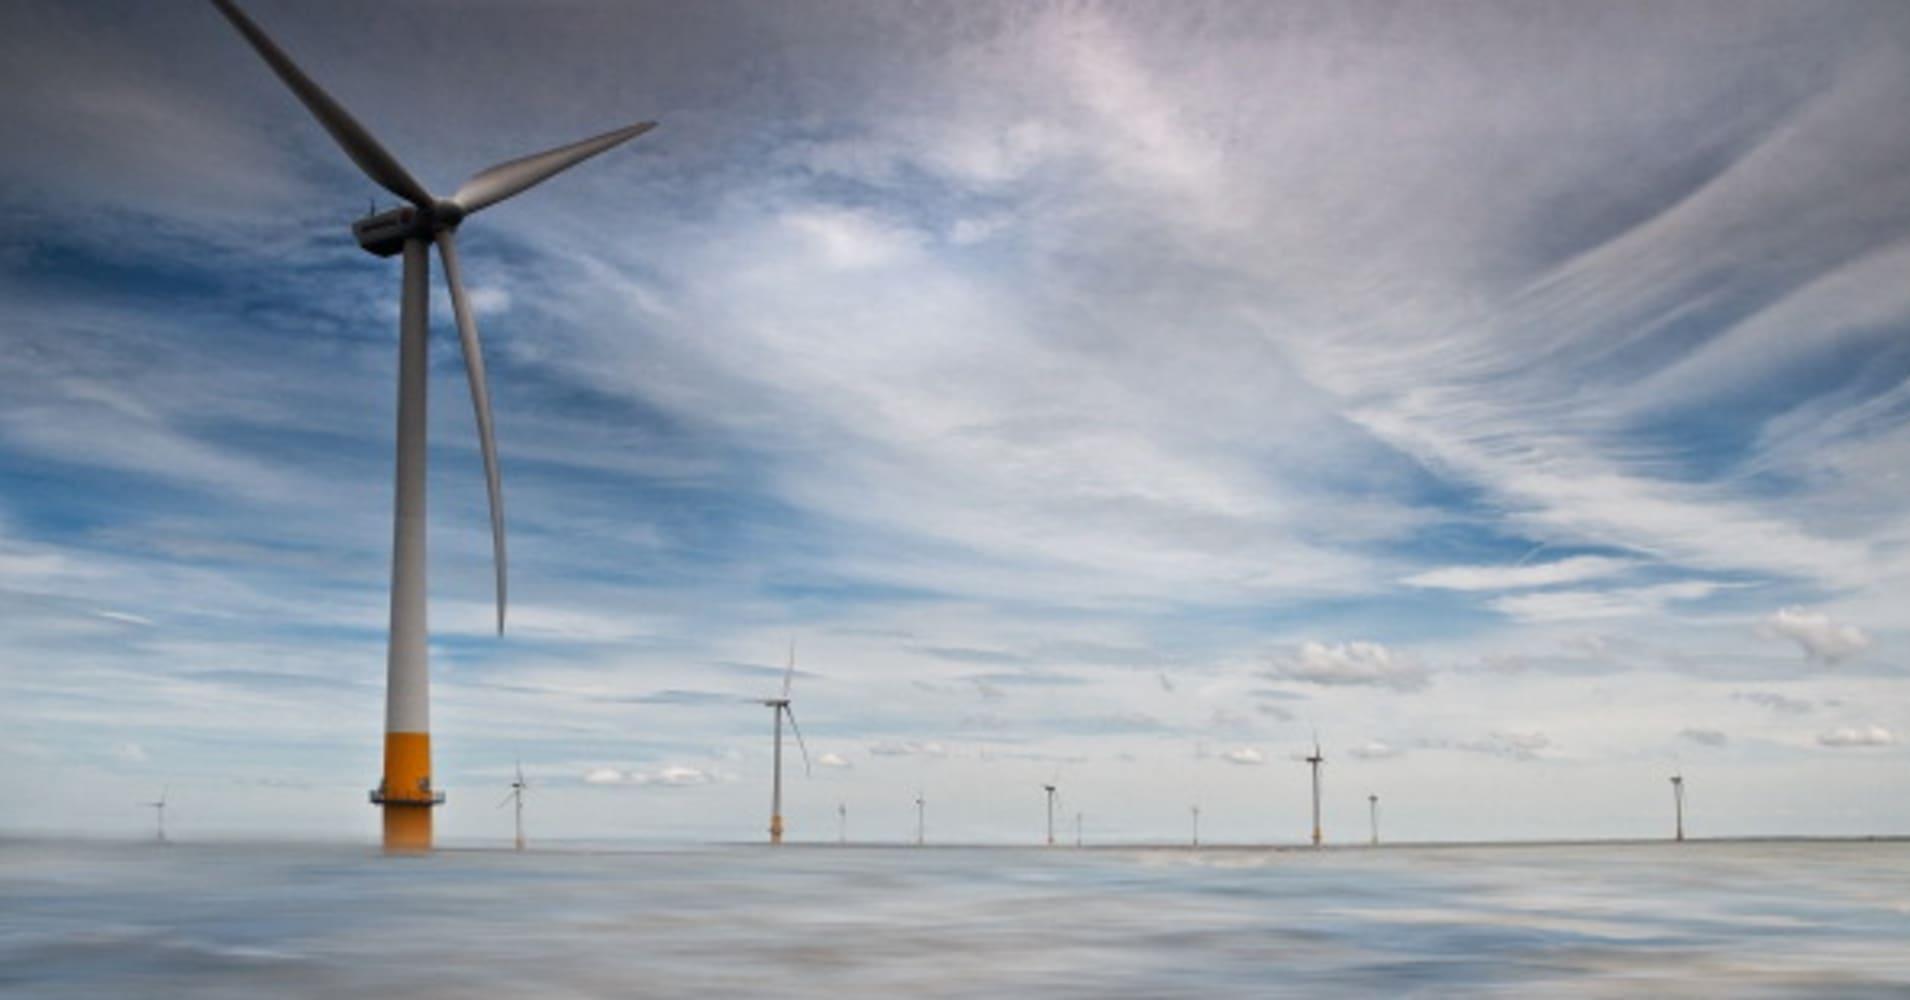 Vestas reaches 100-gigawatt wind turbine installation landmark